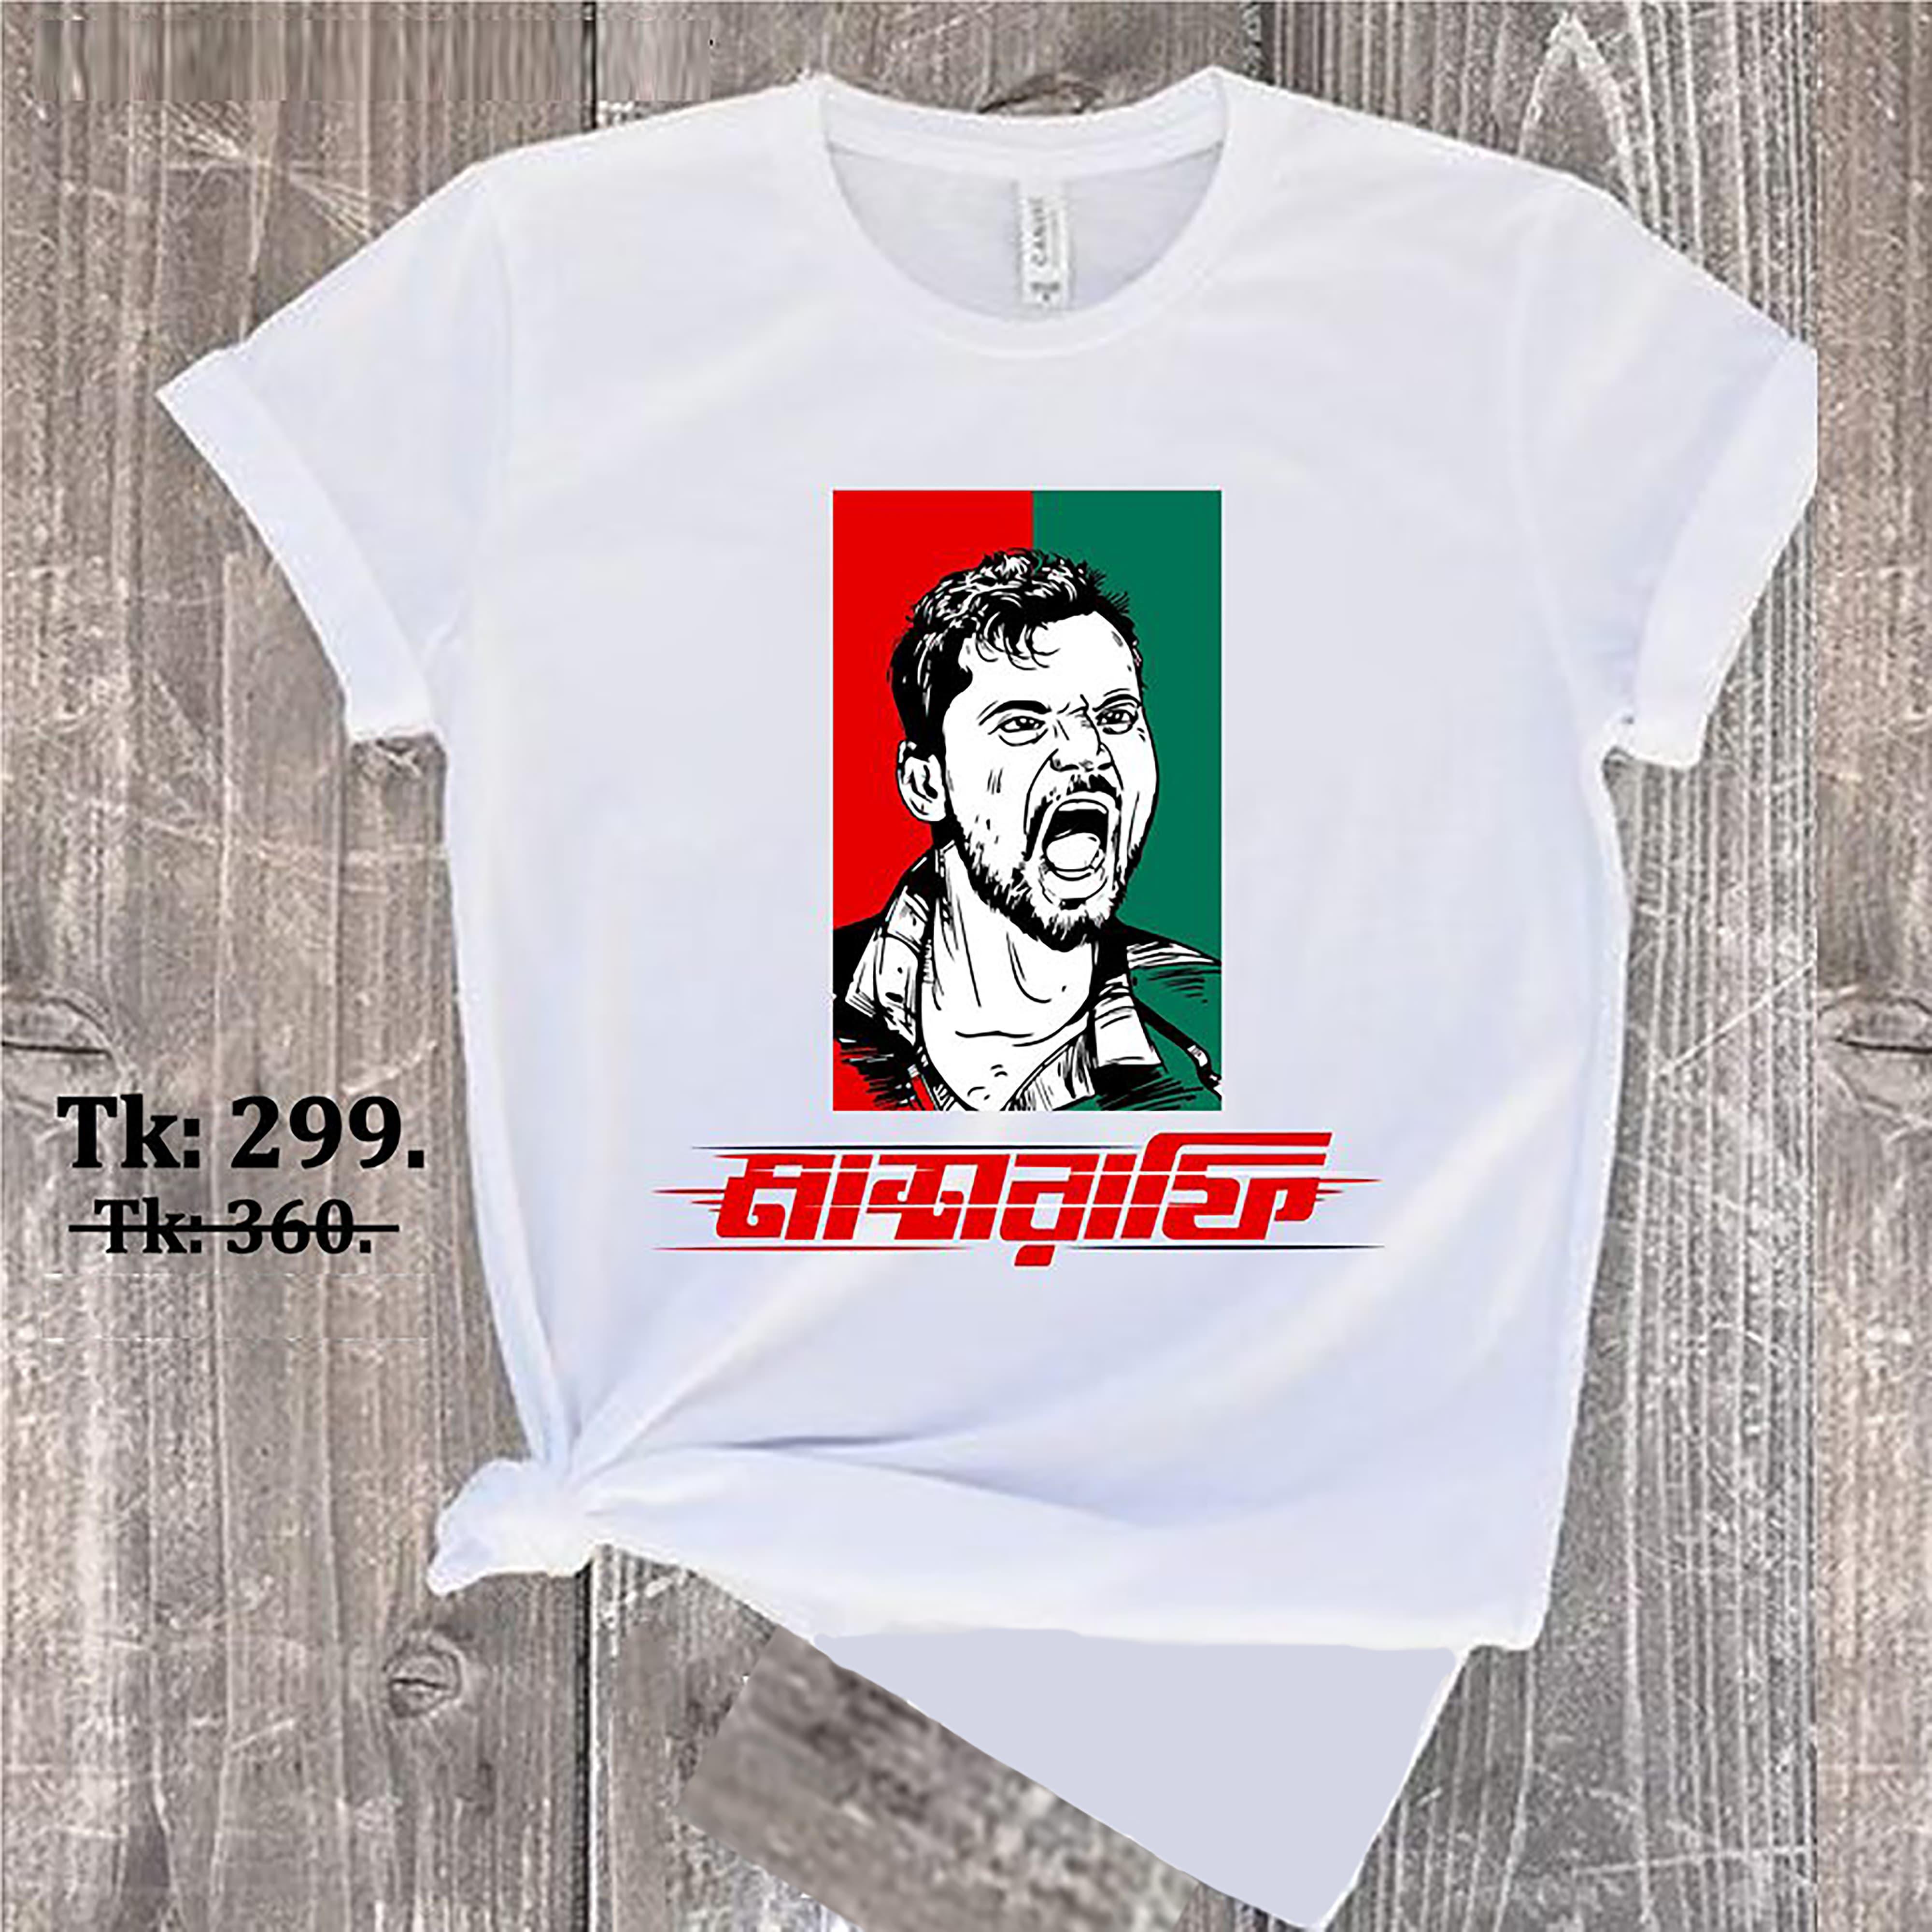 4d8376a7390 Men's T-Shirts Online: Buy T-Shirts For Men In Bangladesh – Daraz